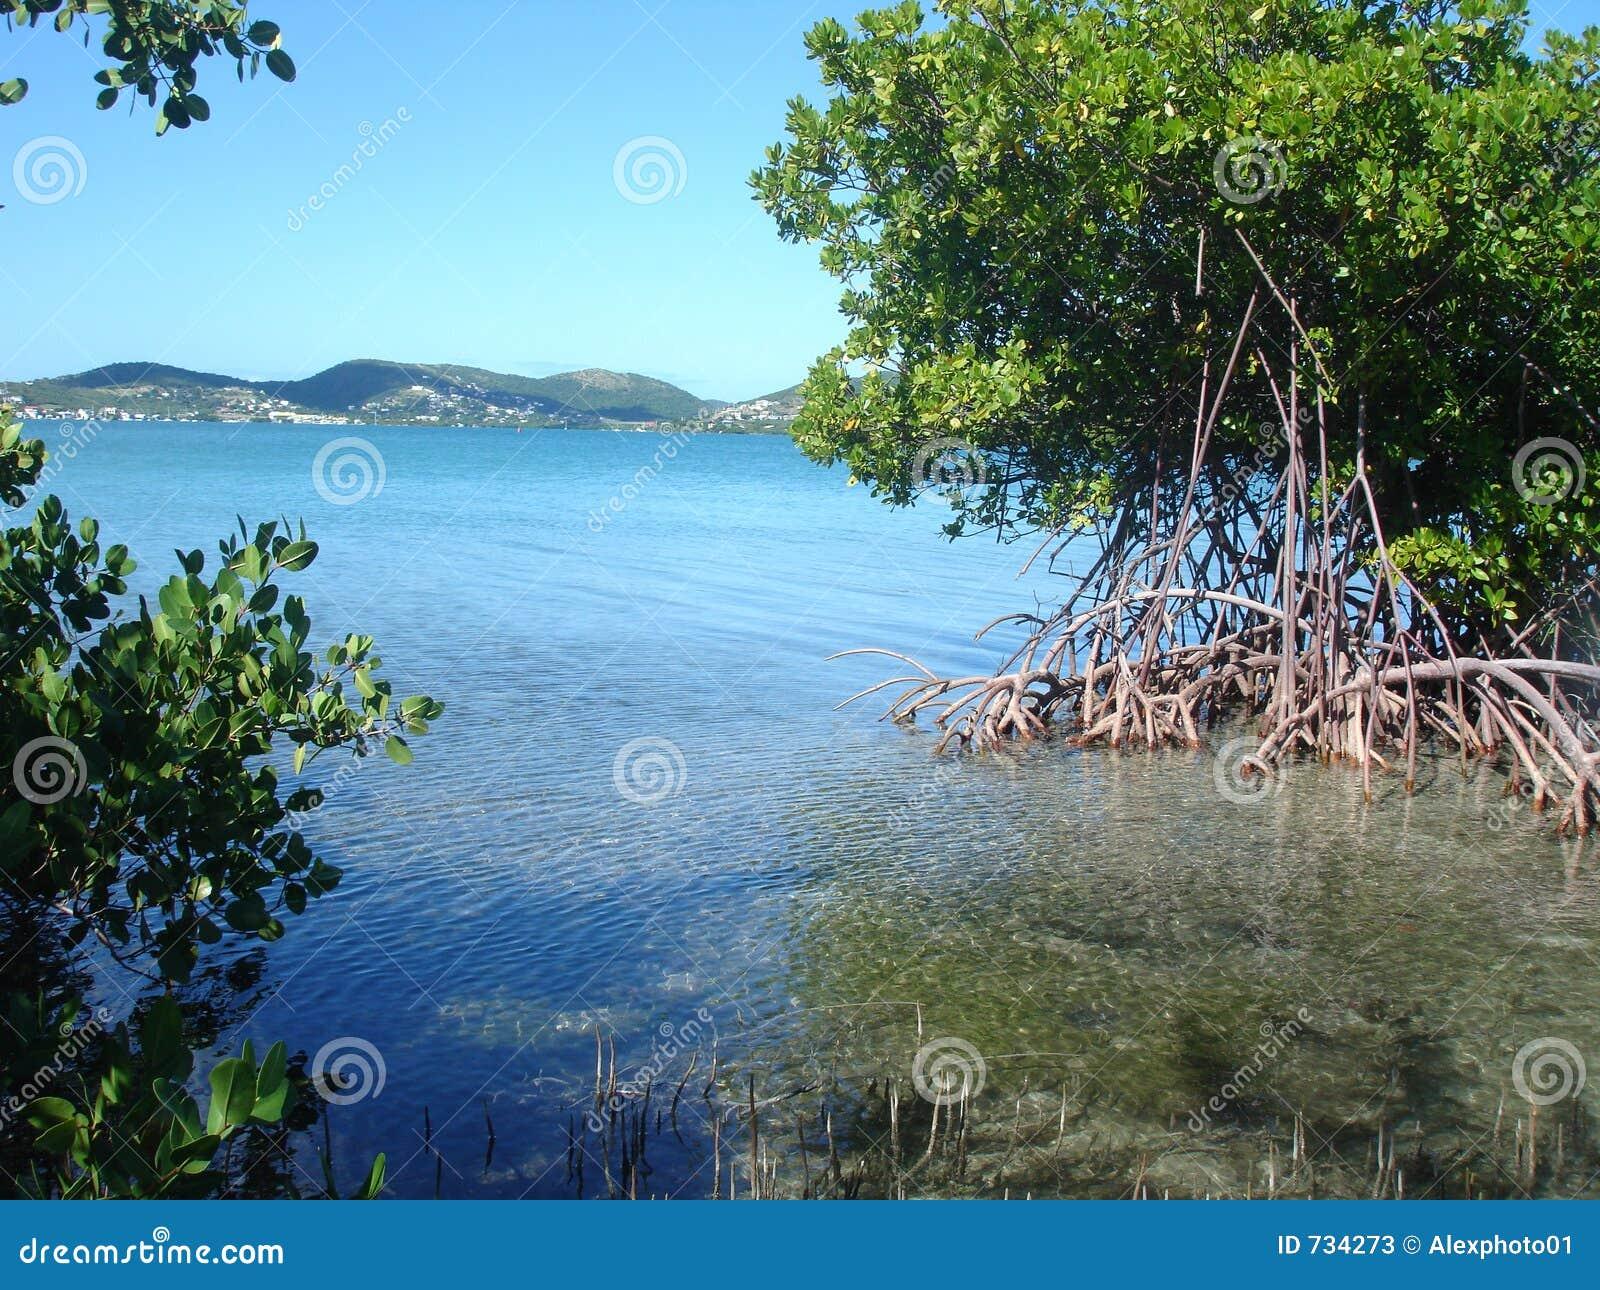 Mangrove View, Puerto Rico, Caribbean